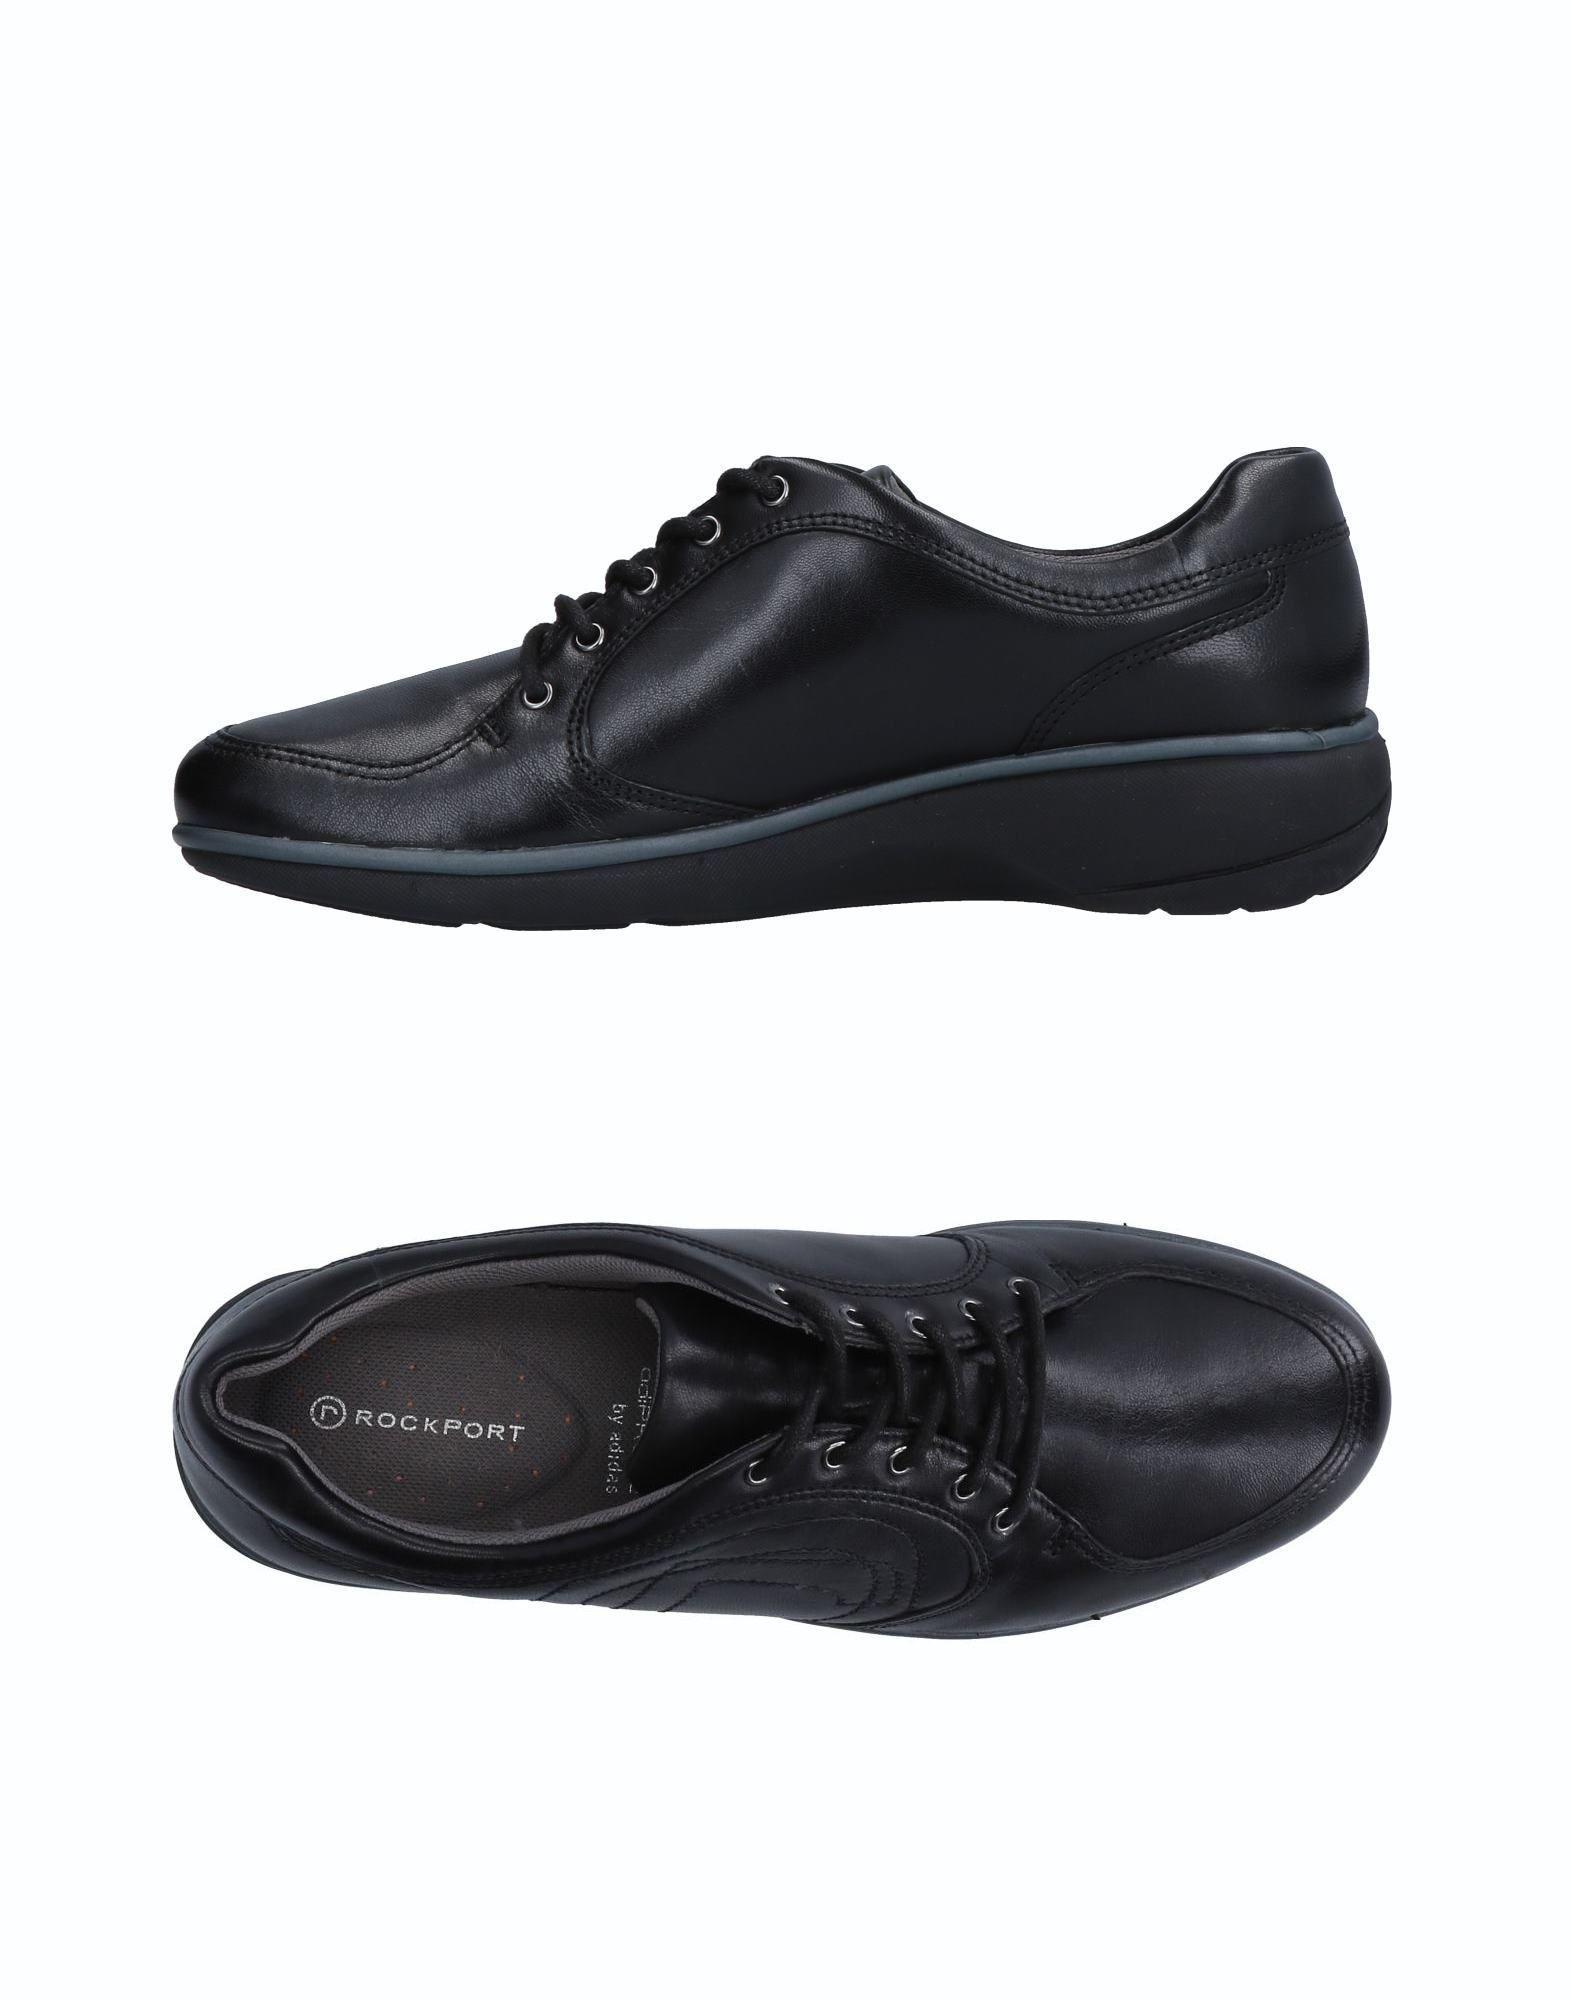 Rockport Bas-tops Et Chaussures De Sport Z7OCQi1zlp